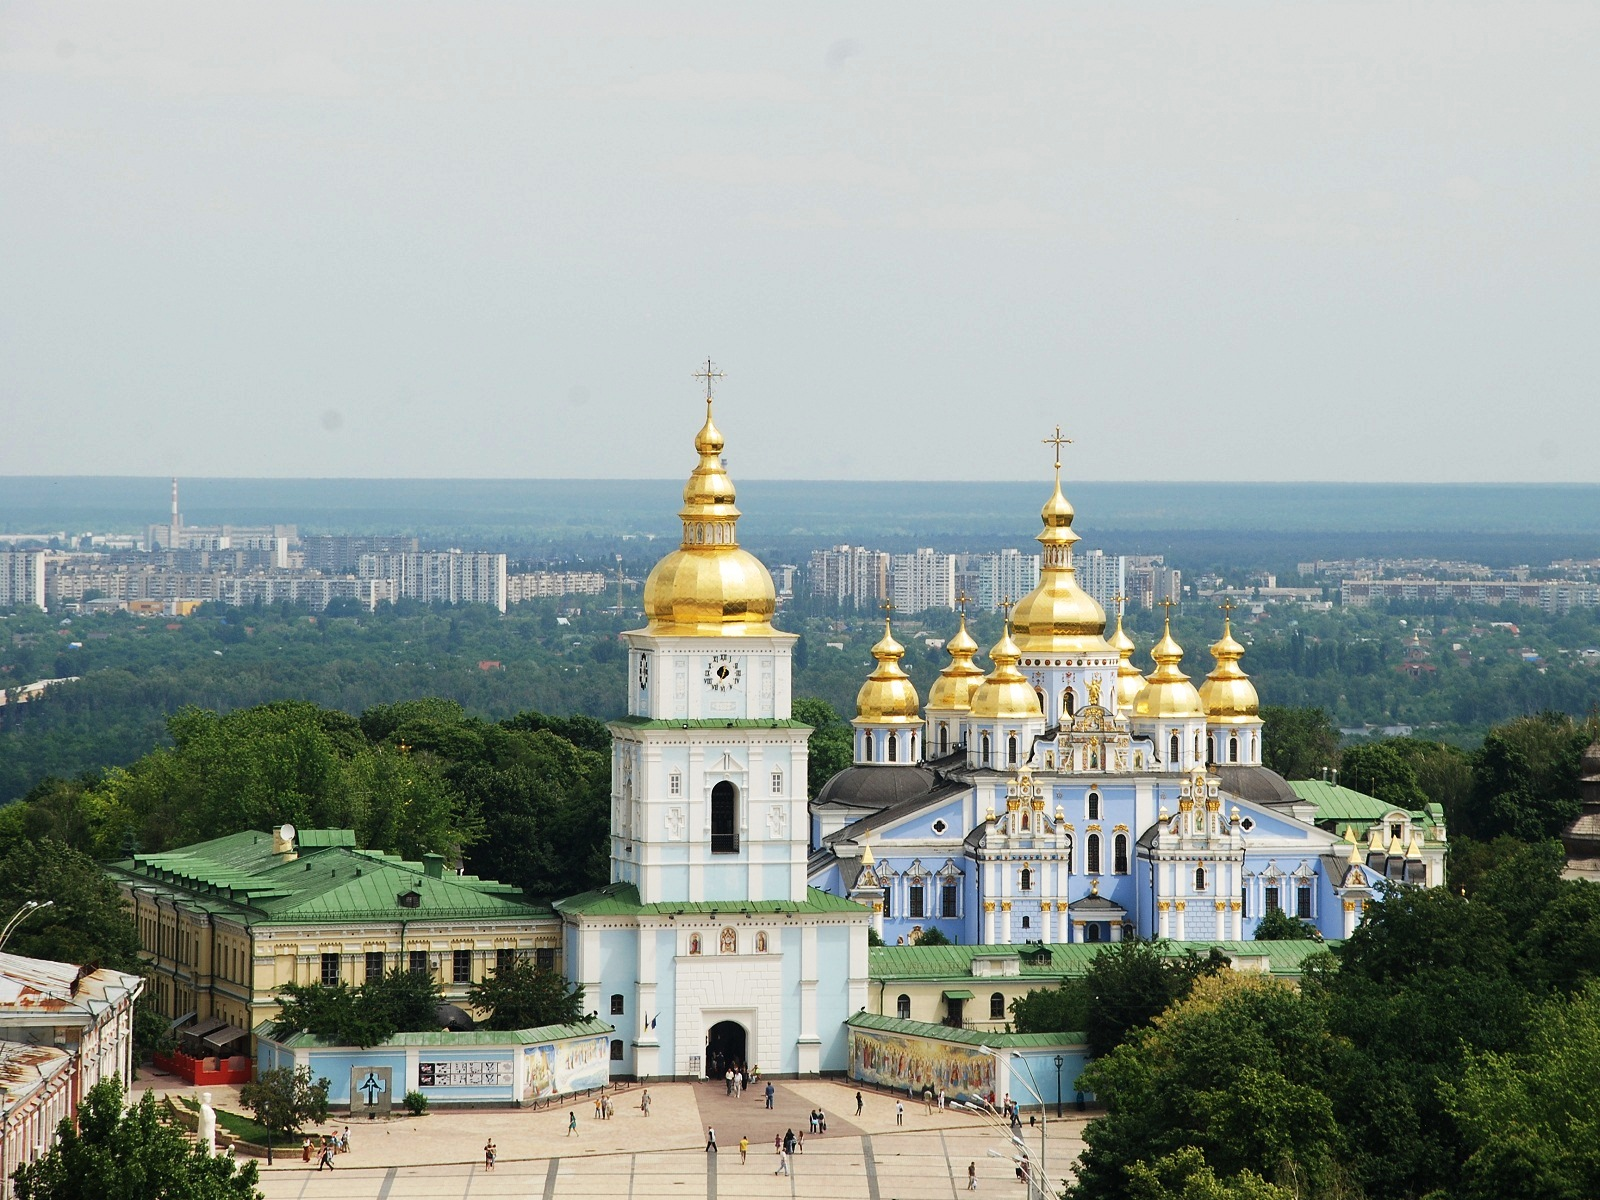 ukraine_beautiful_sights_656061.jpg